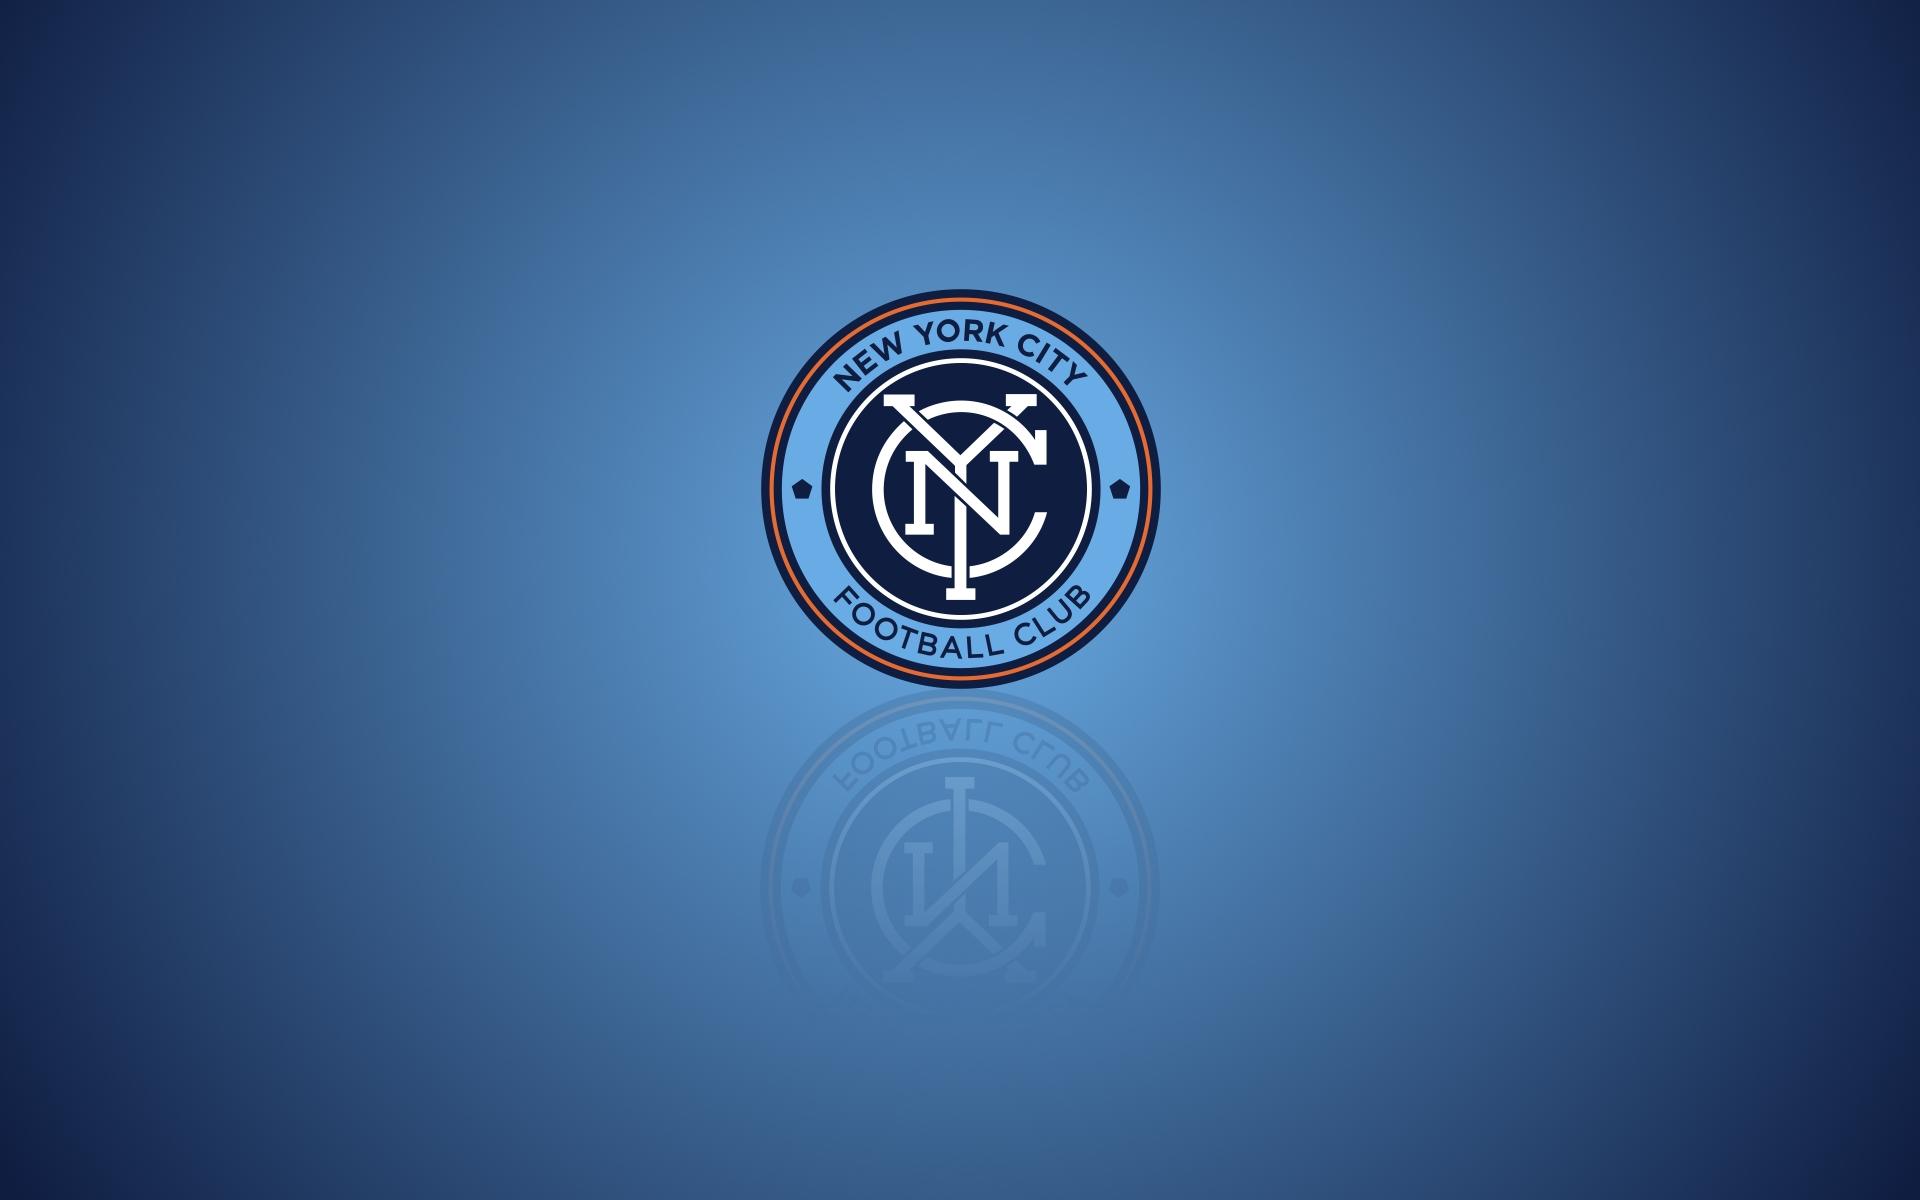 New York City Fc Logos Download